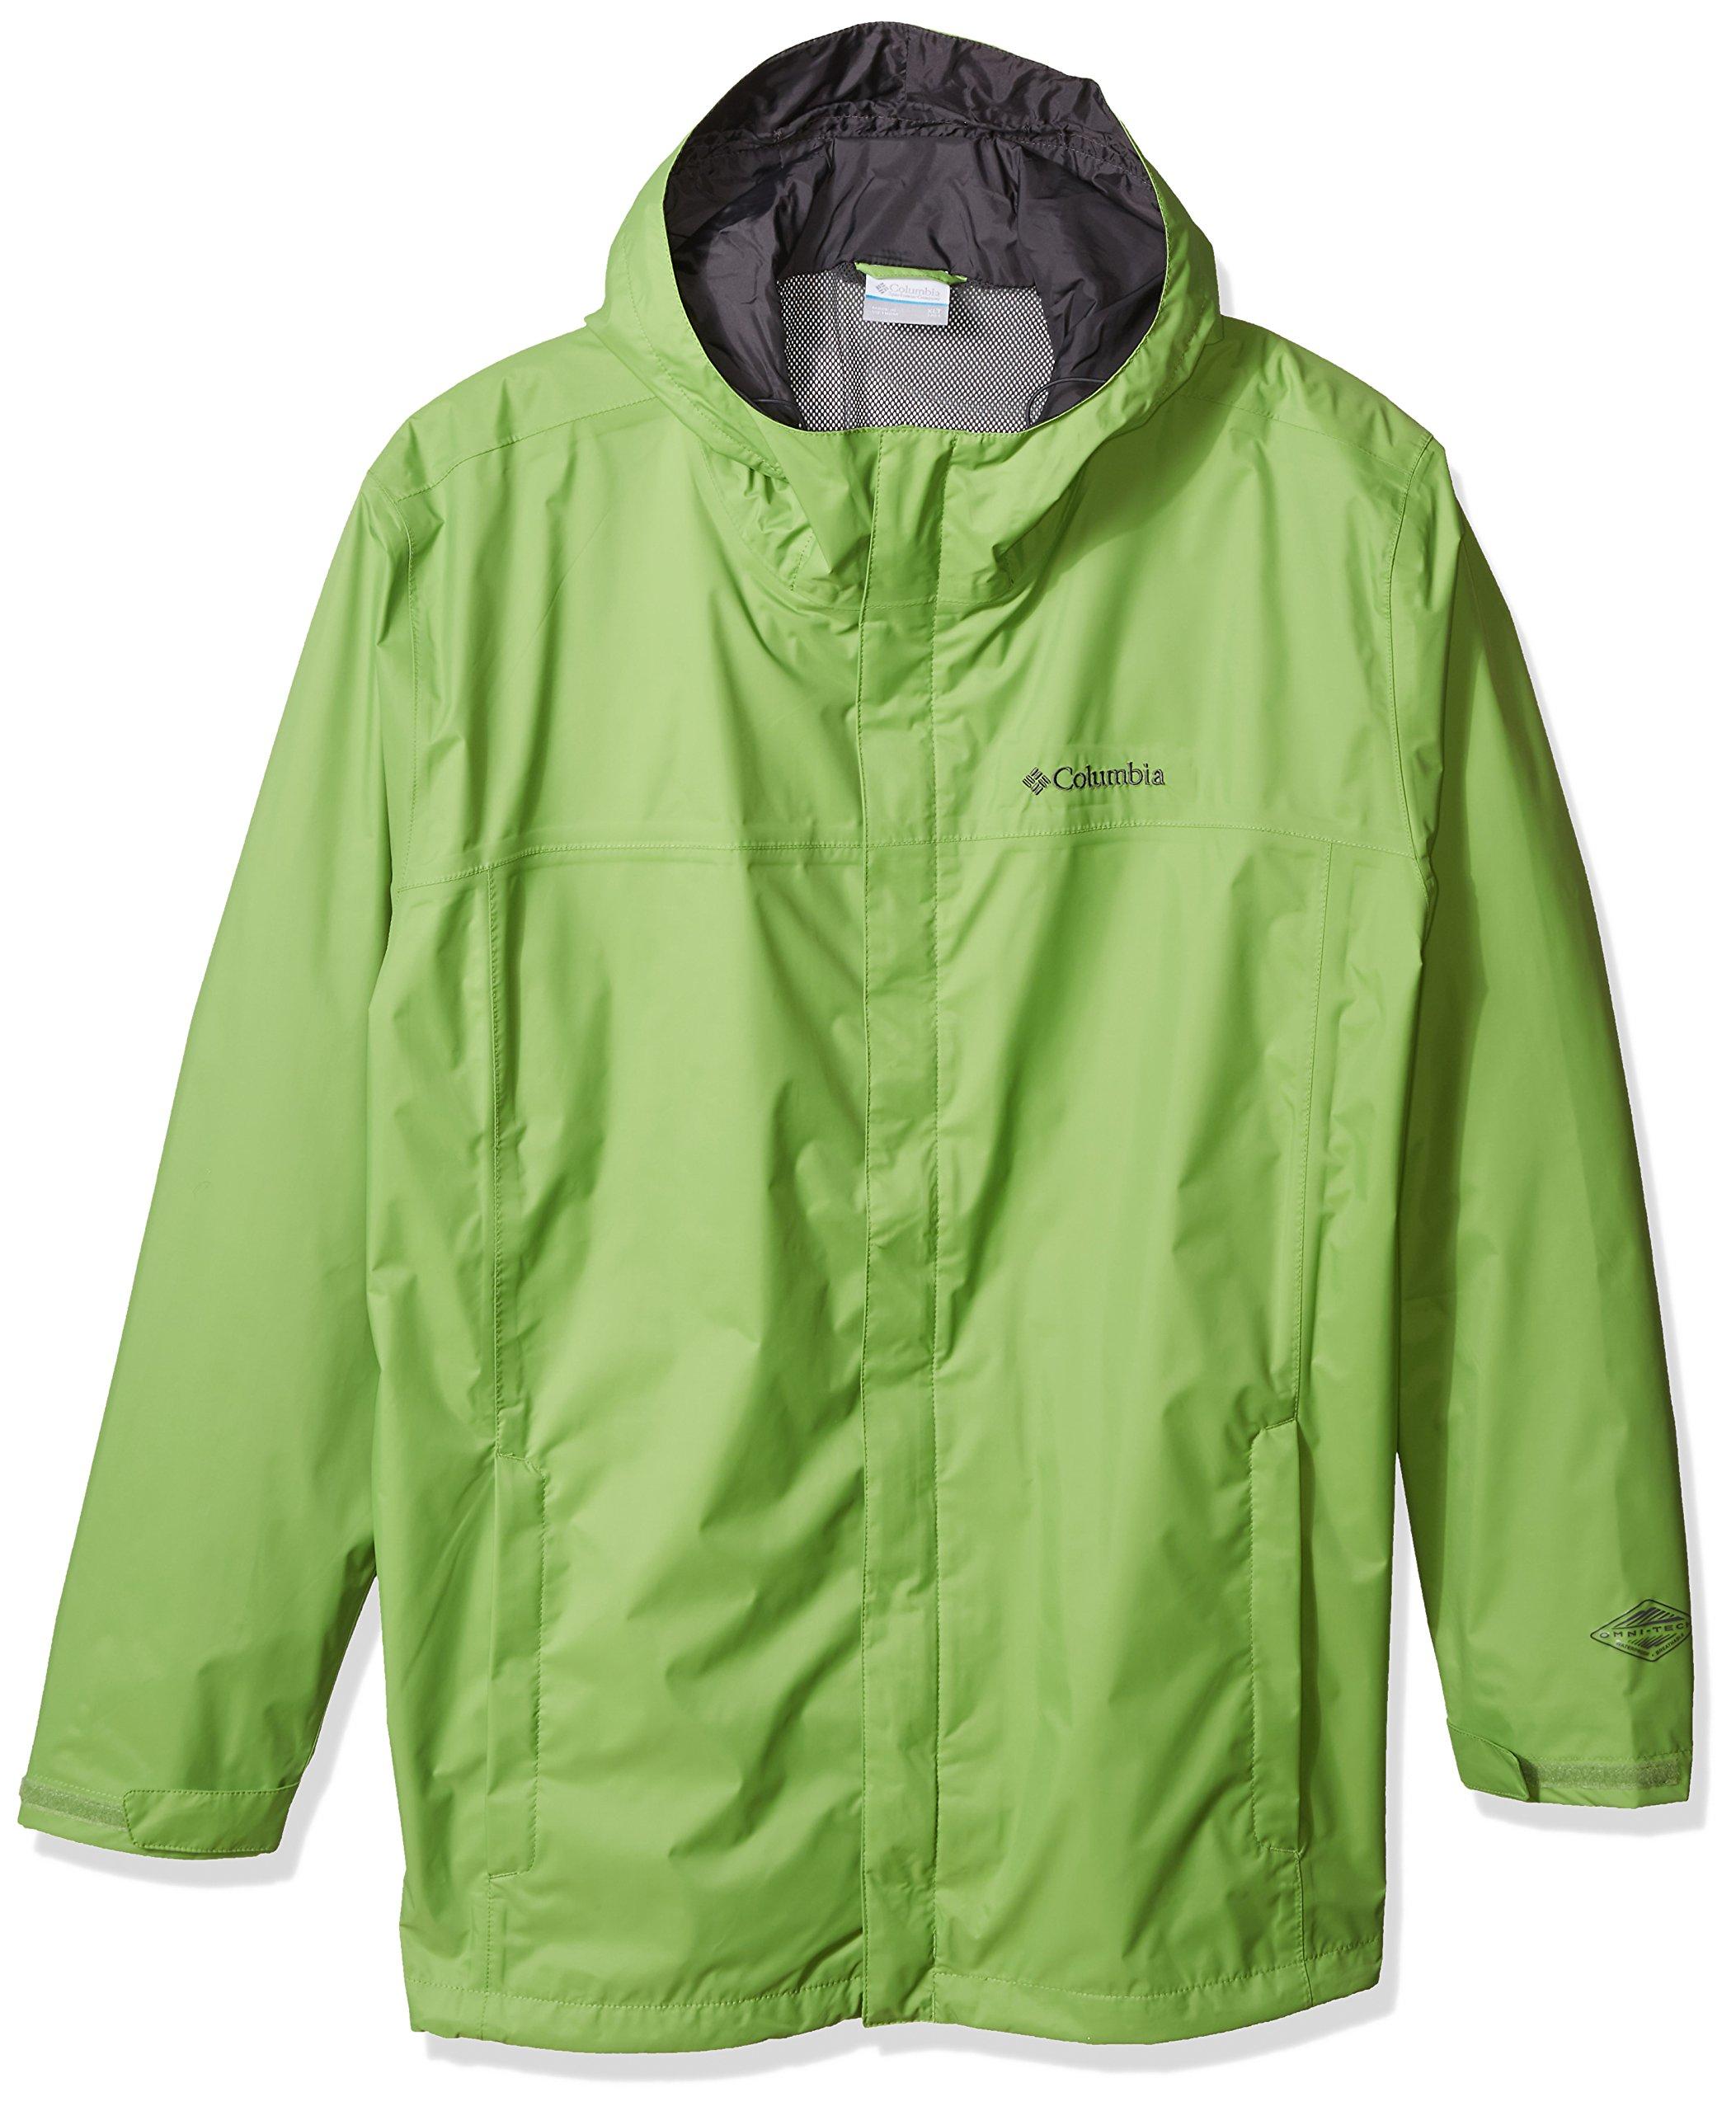 Columbia Men's Big and Tall Watertight Ii Jacket, Spring 4X